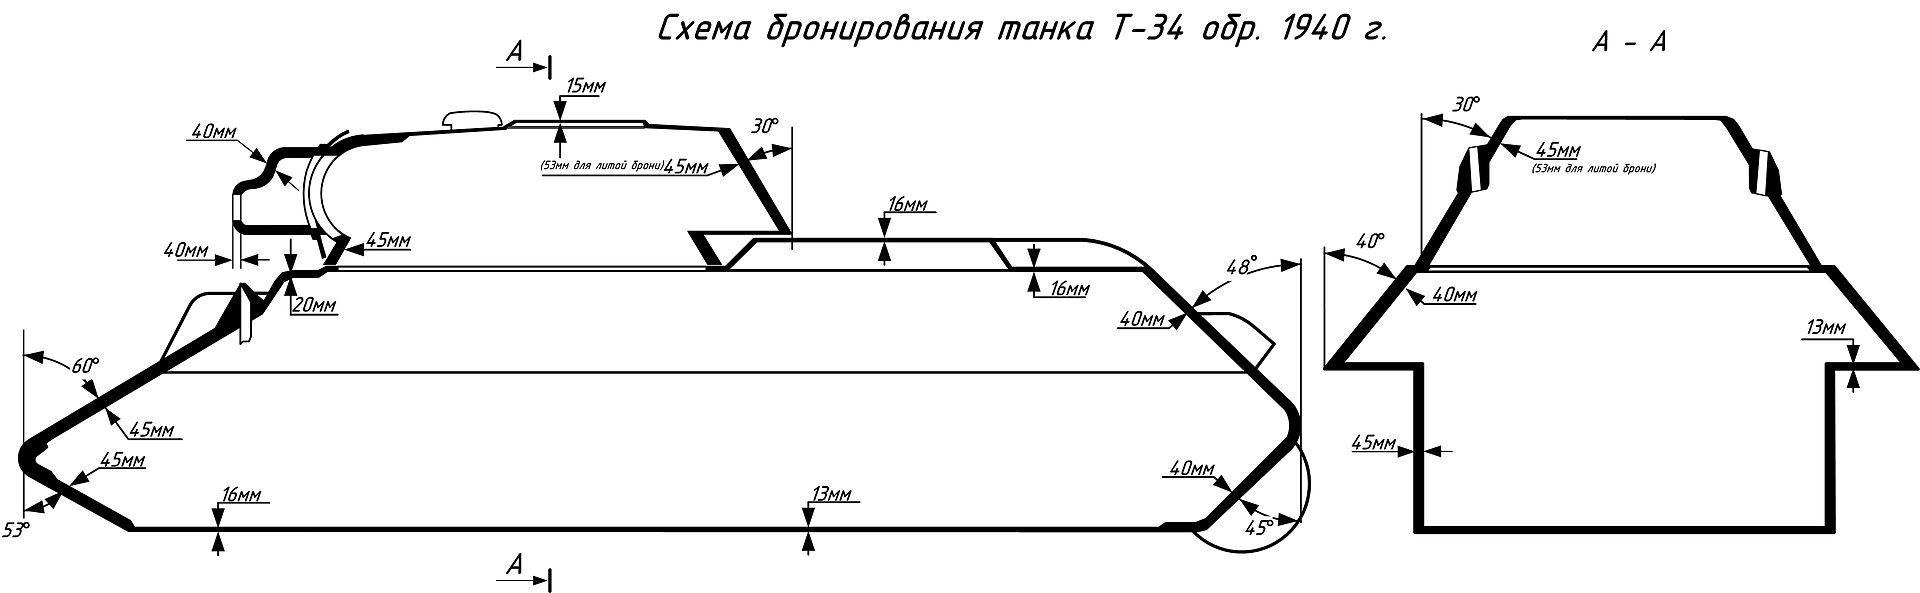 Фердинанд Порше признал превосходство русского танка Т-34